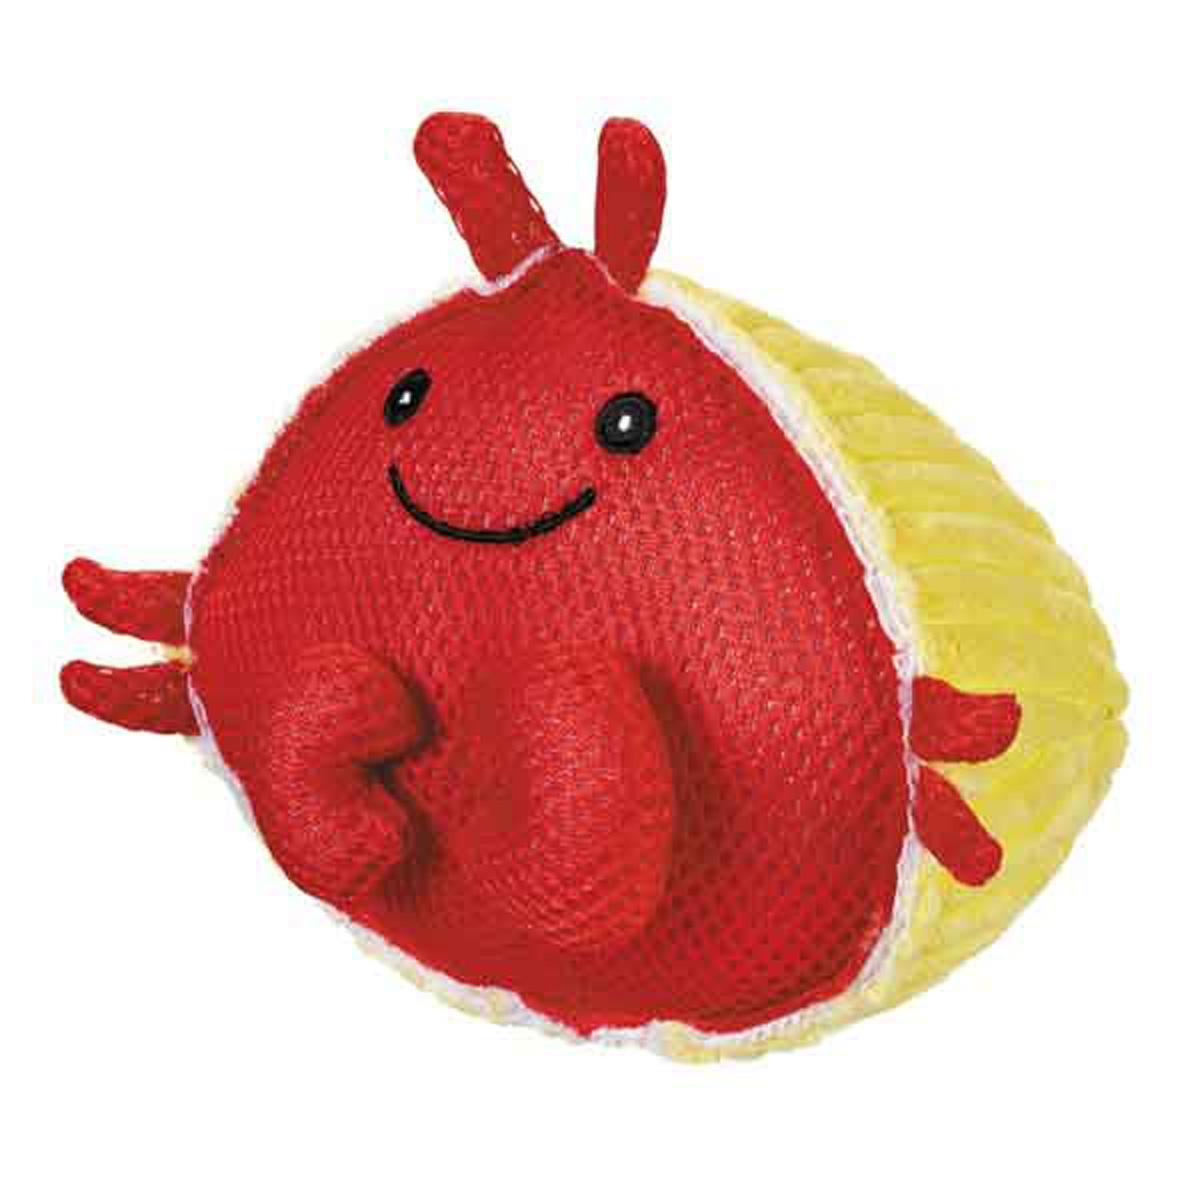 Grriggles Aquadudes Dog Toy - Hermit Crab